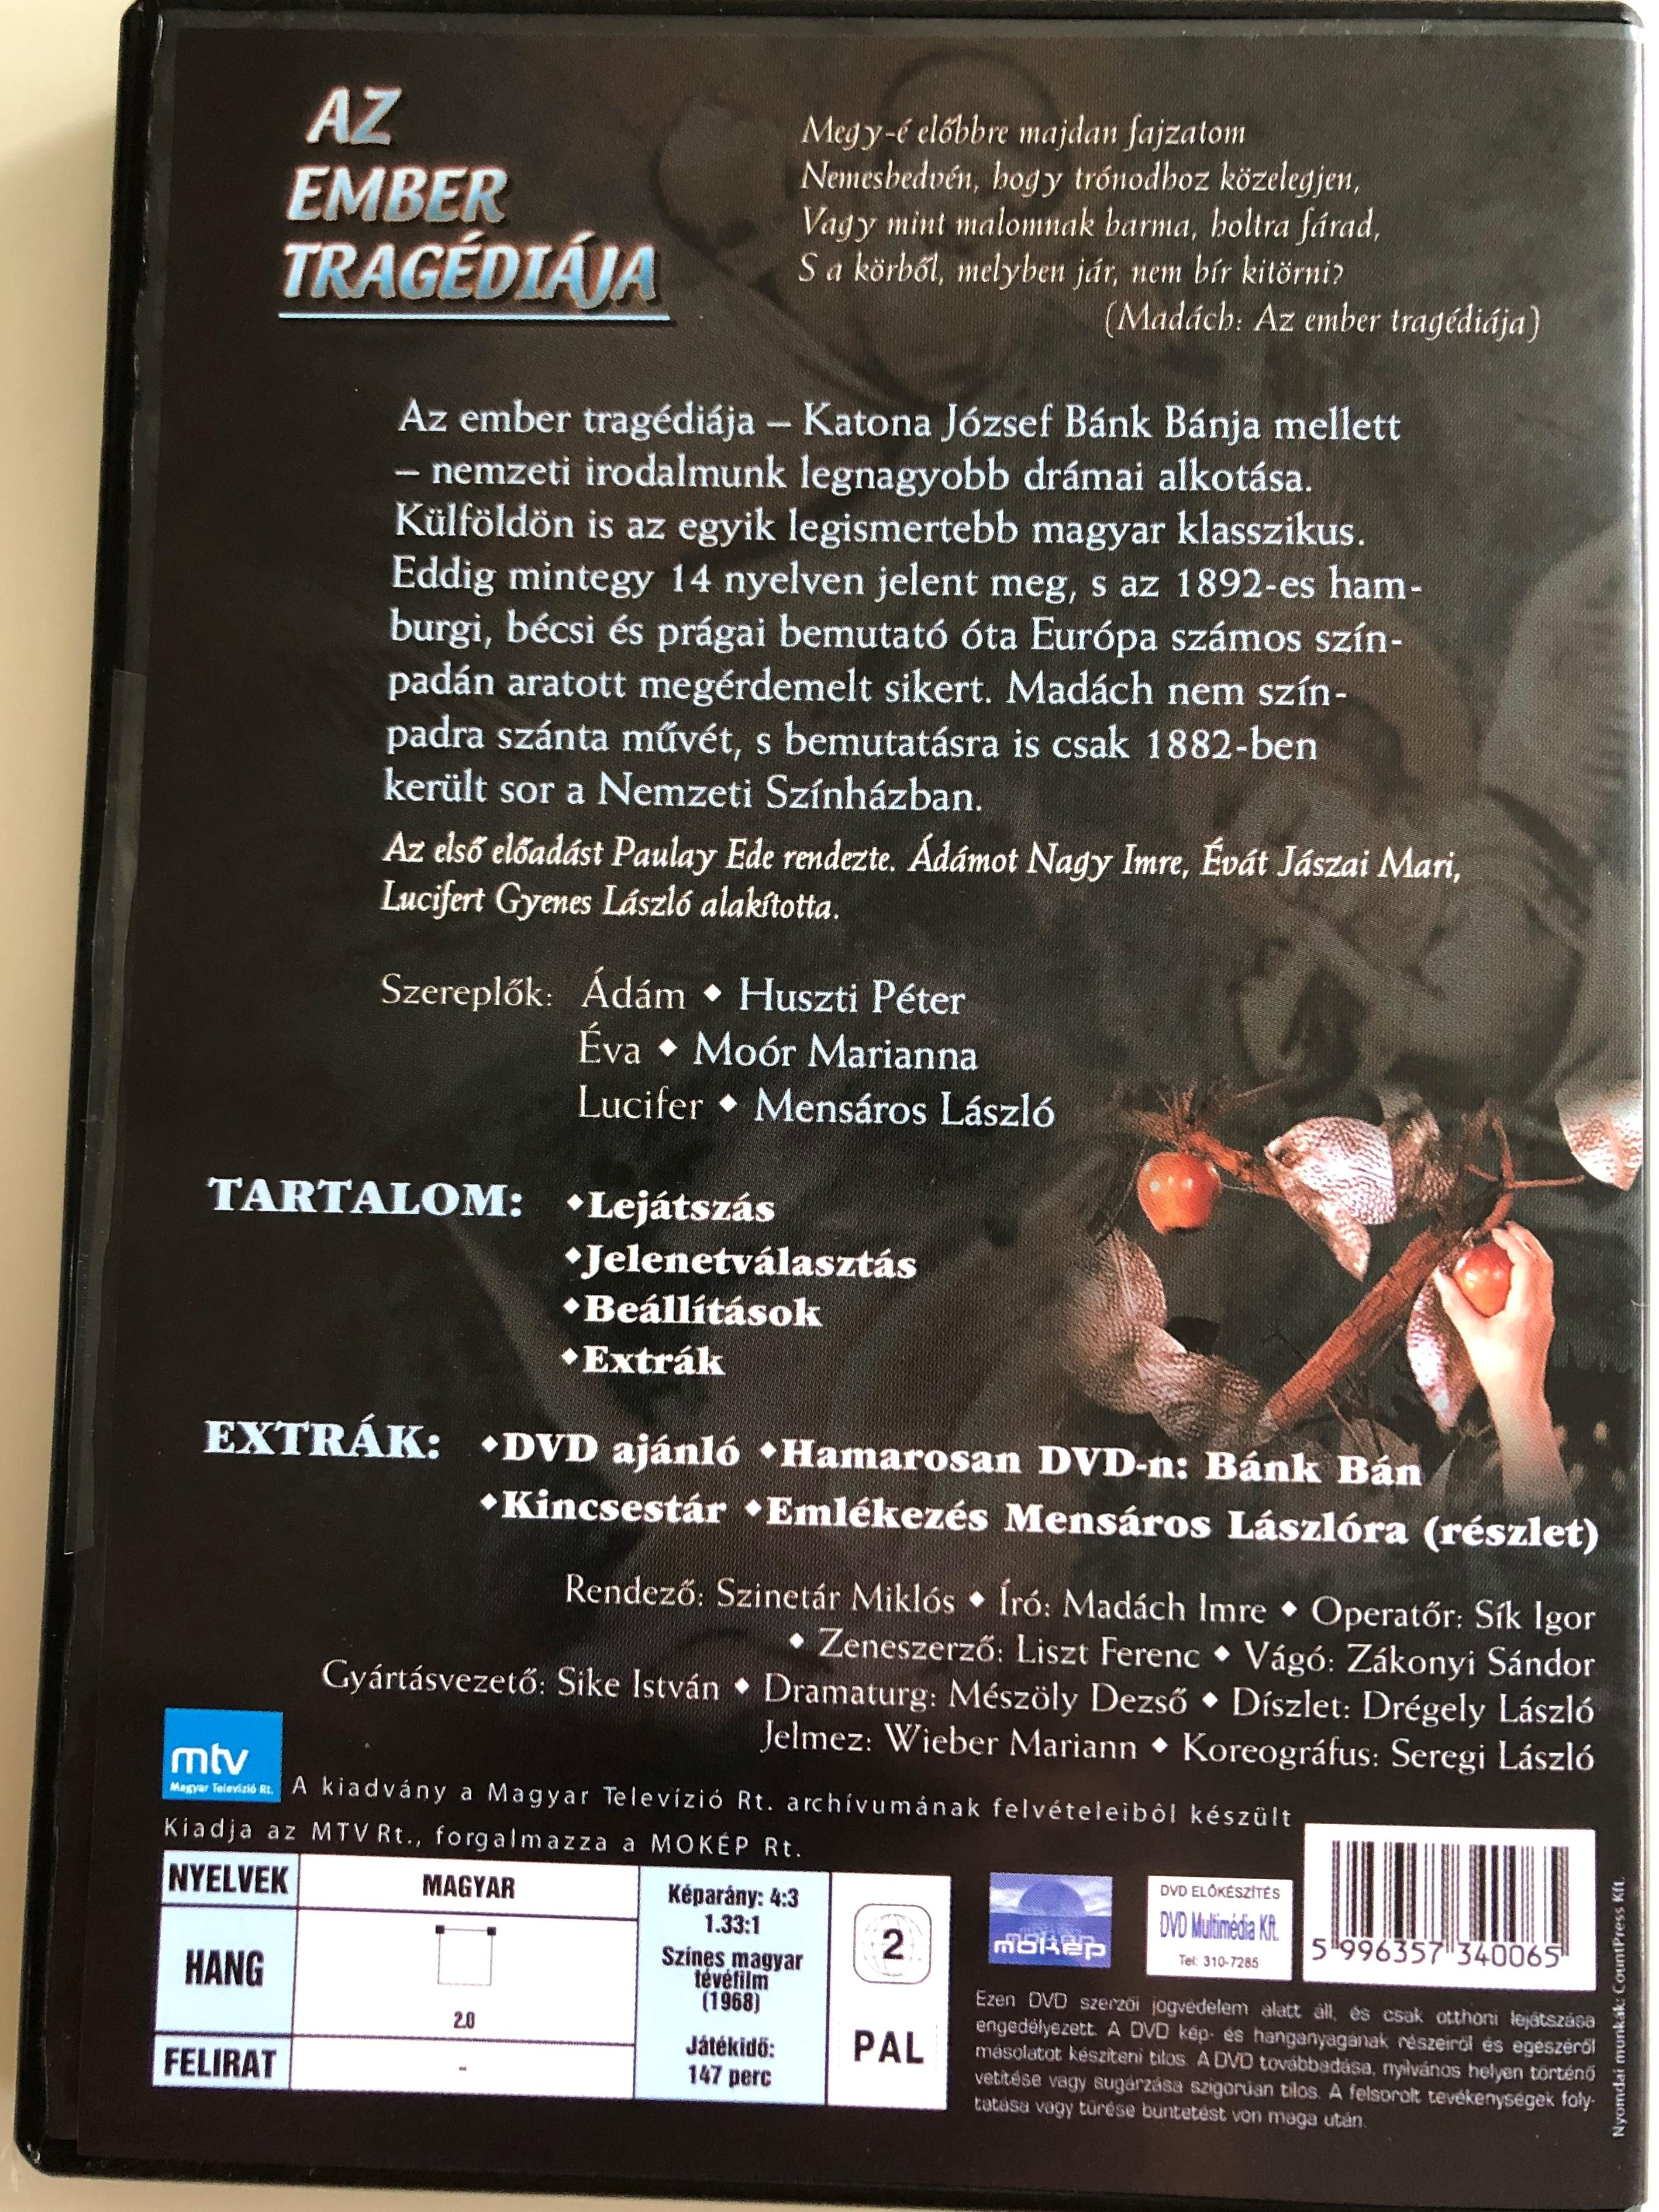 az-ember-trag-di-ja-mad-ch-imre-dvd-1969-the-tragedy-of-man-by-imre-mad-ch-directed-by-szinet-r-mikl-s-starring-huszti-p-ter-mo-r-marianna-mens-ros-l-szl-bessenyei-ferenc-b-sti-lajos-ronyecz-m-ria-b-lint-andr-s-2-.jpg